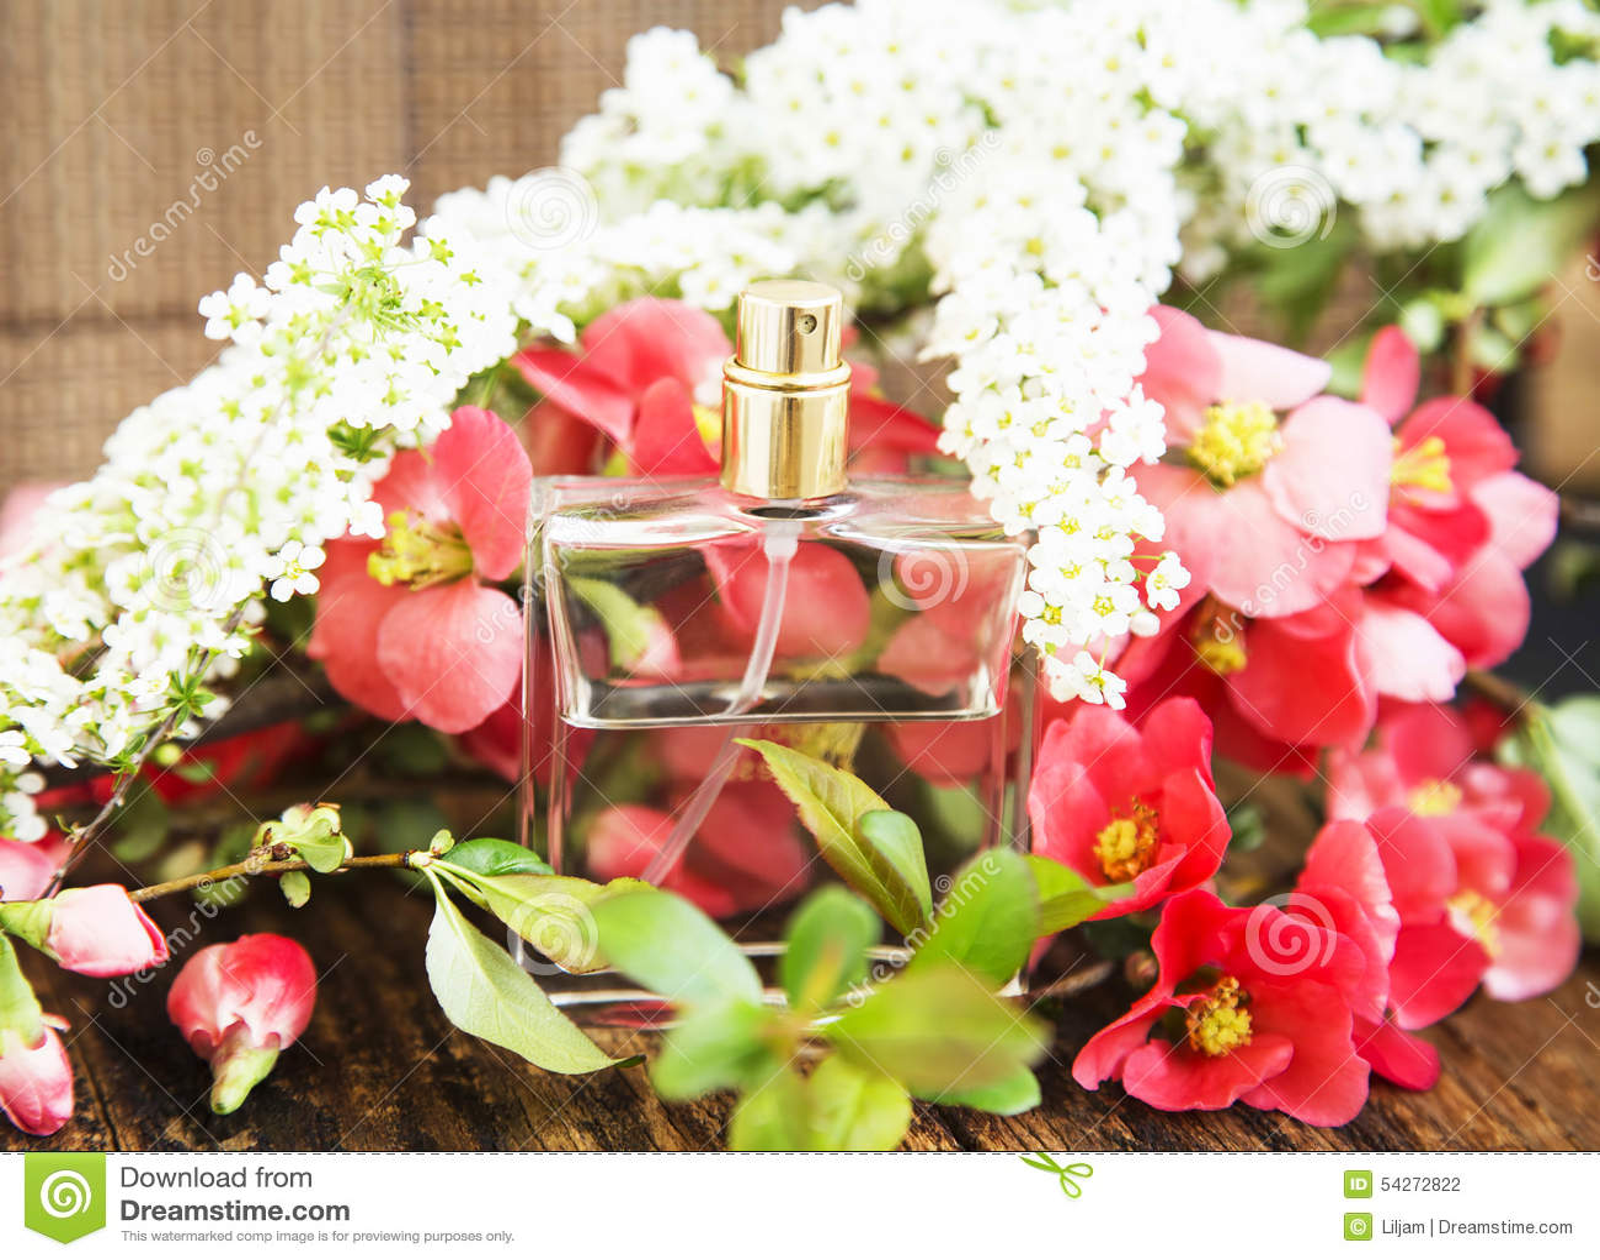 Flower perfume bottle stock photo image of bottle female 54272822 flower perfume in transparent bottle with spring blossom mightylinksfo